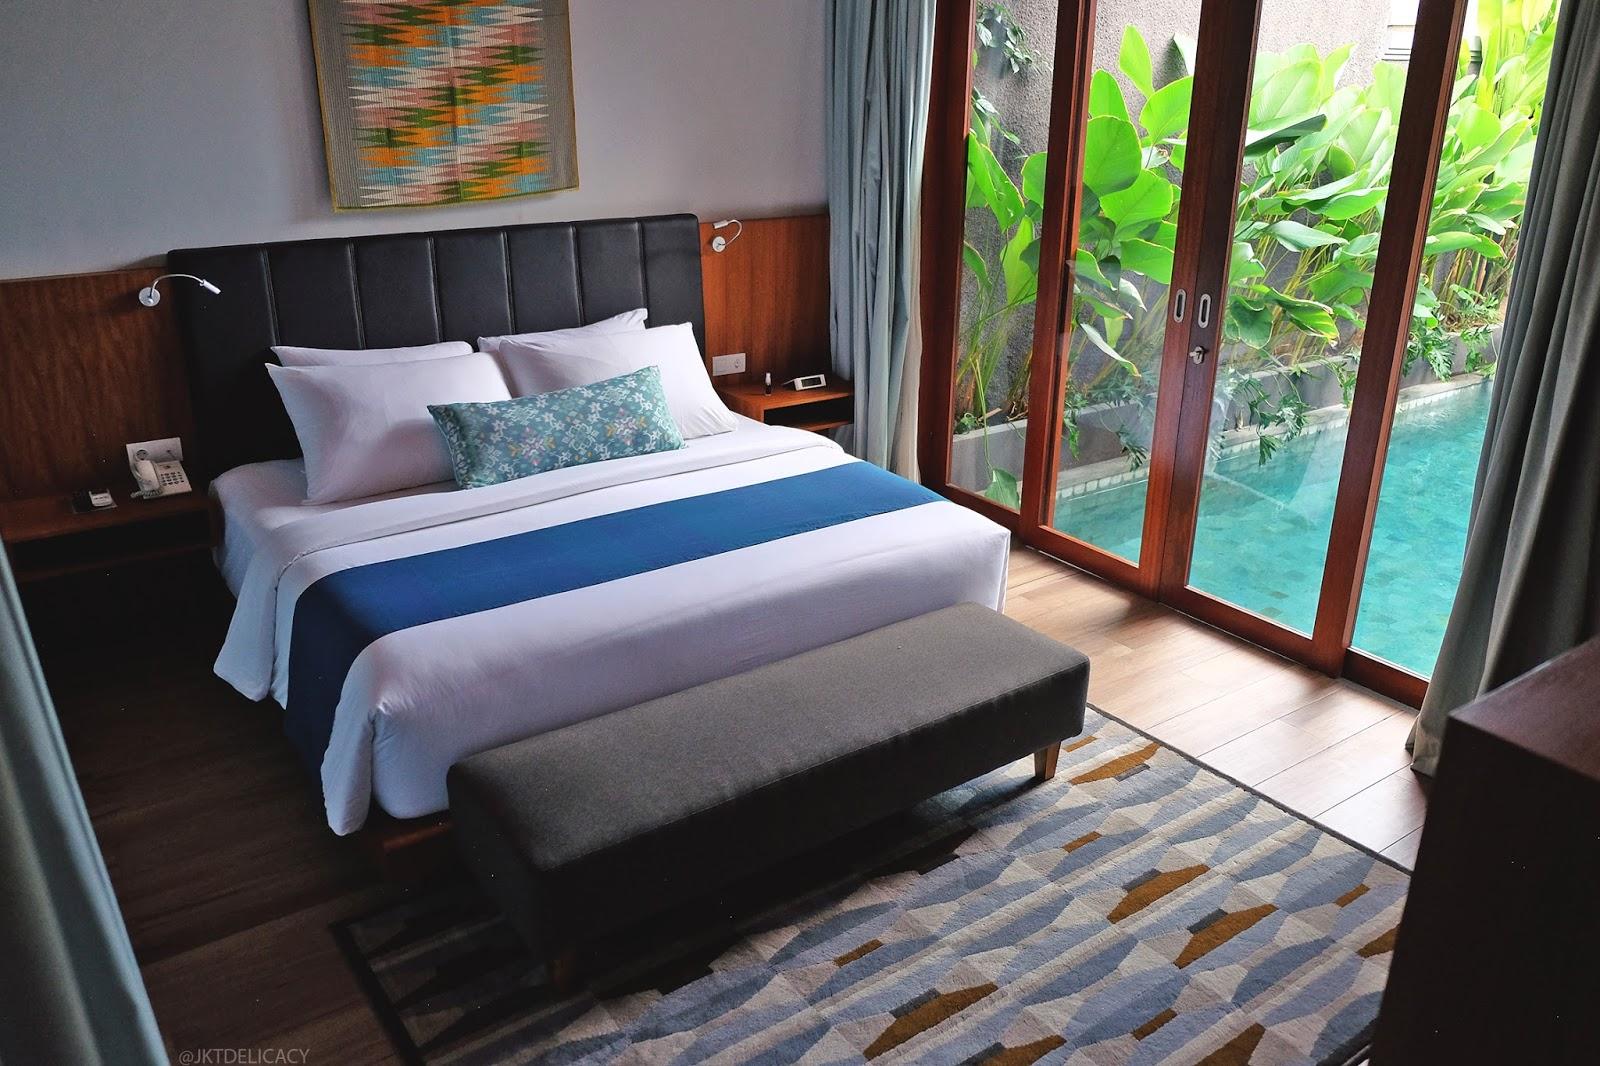 Jktdelicacy Com New Private Pool Villa By S18 Bali Villas At Kuta Bali